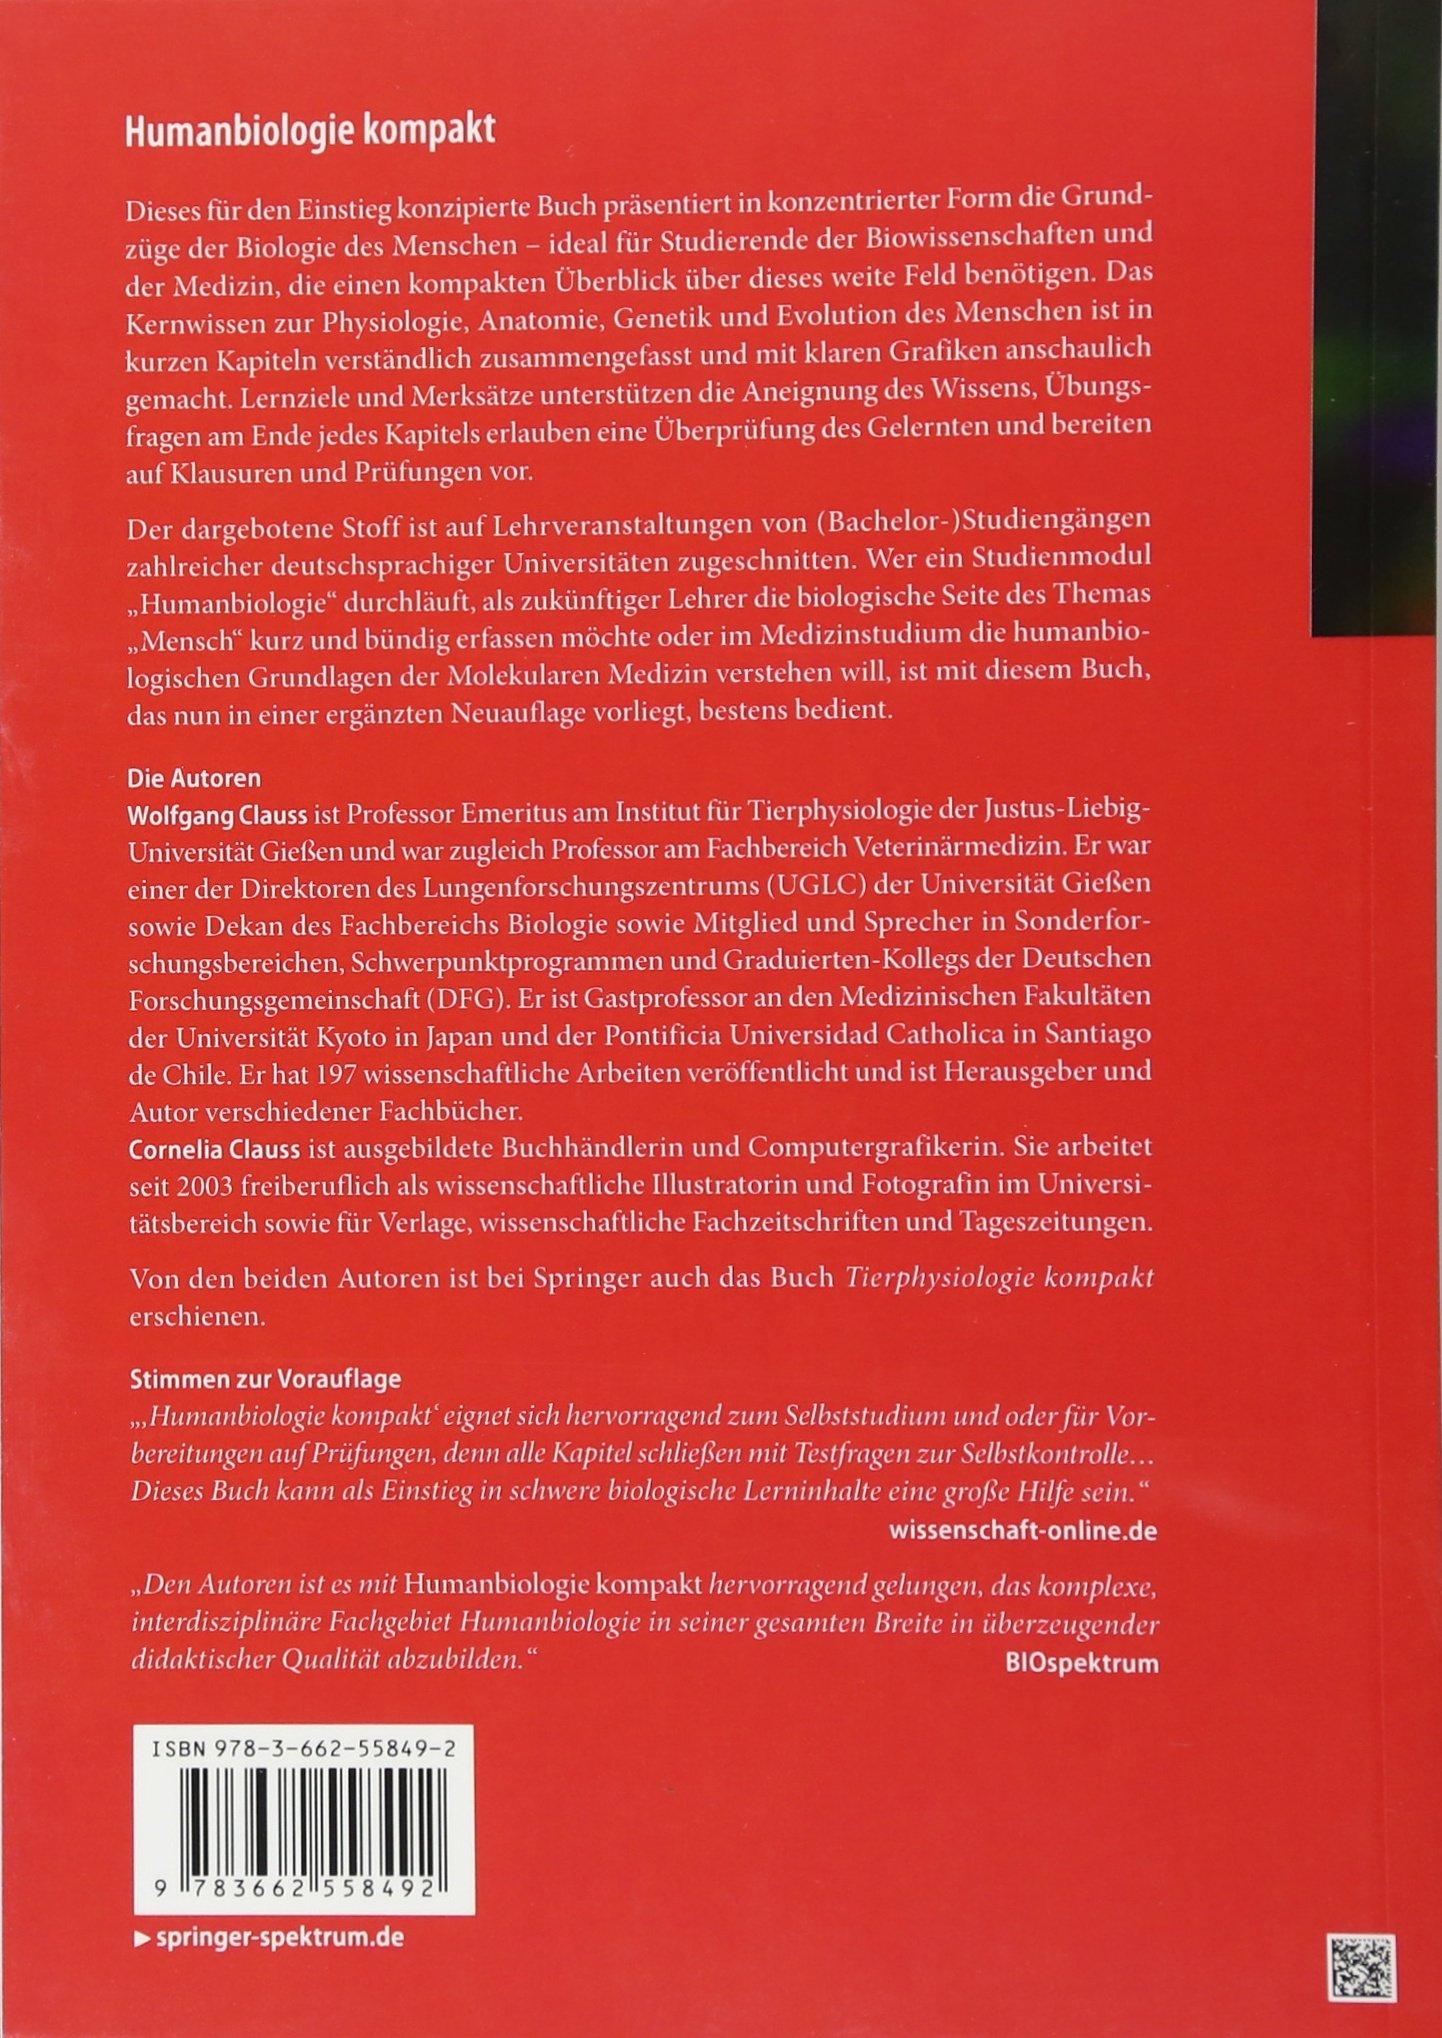 Humanbiologie kompakt: Amazon.de: Wolfgang Clauss, Cornelia Clauss ...